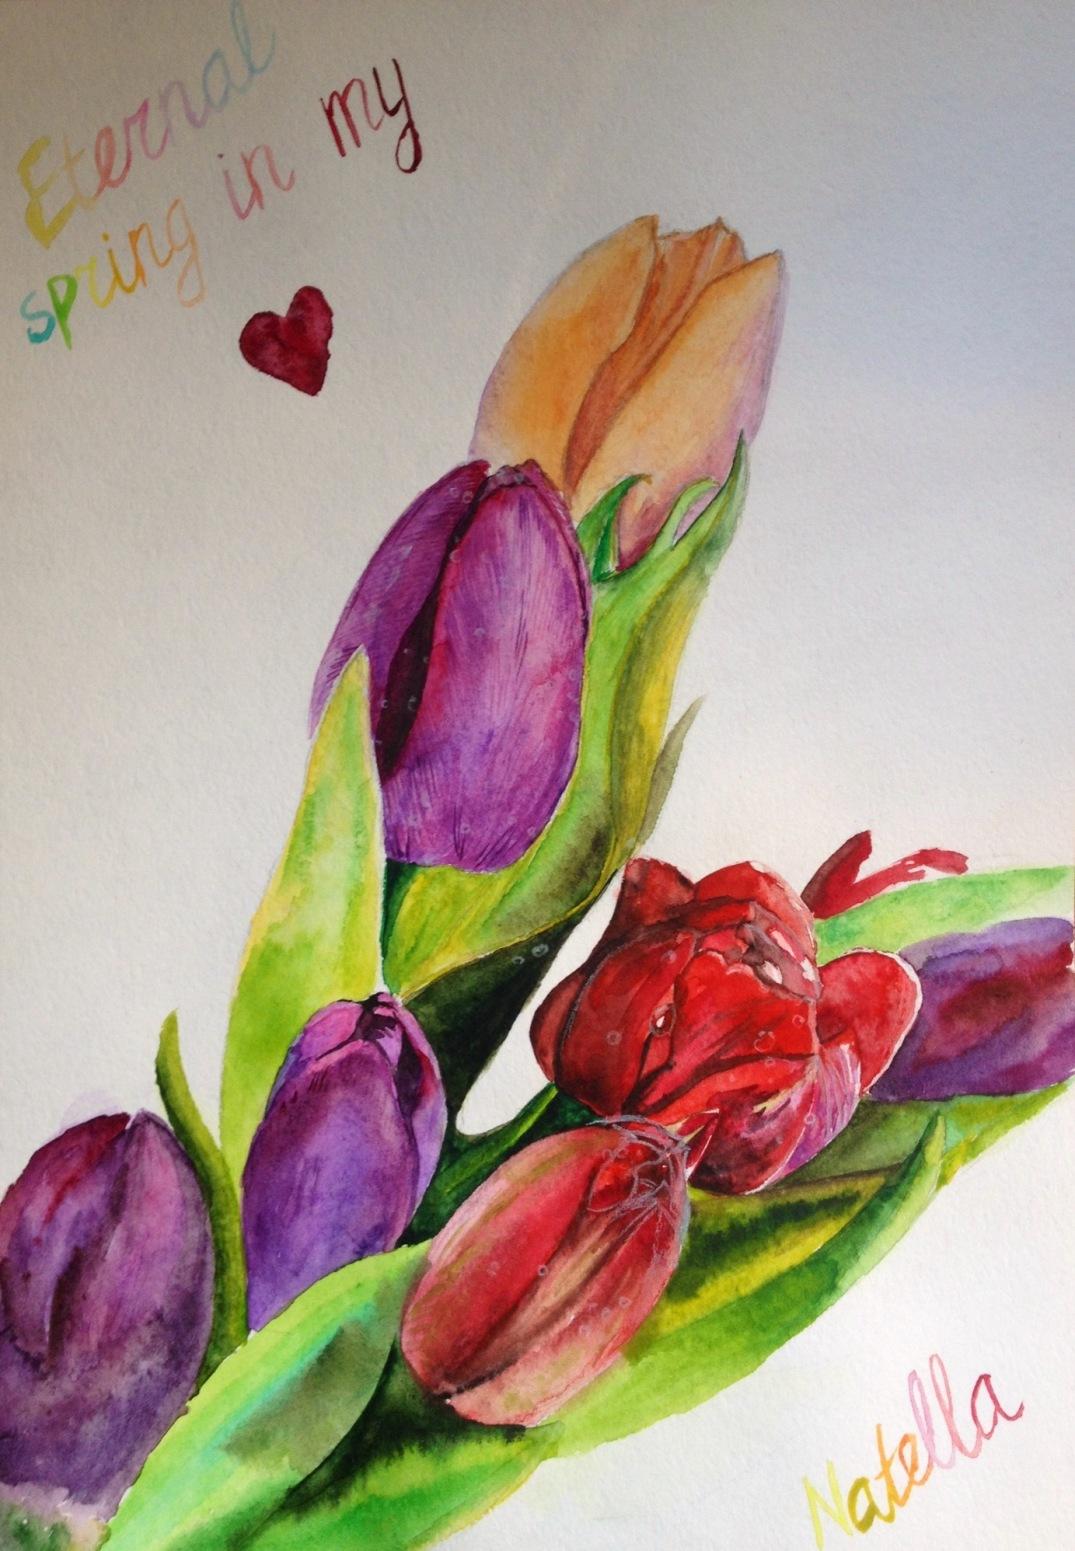 Eternal spring in my heart